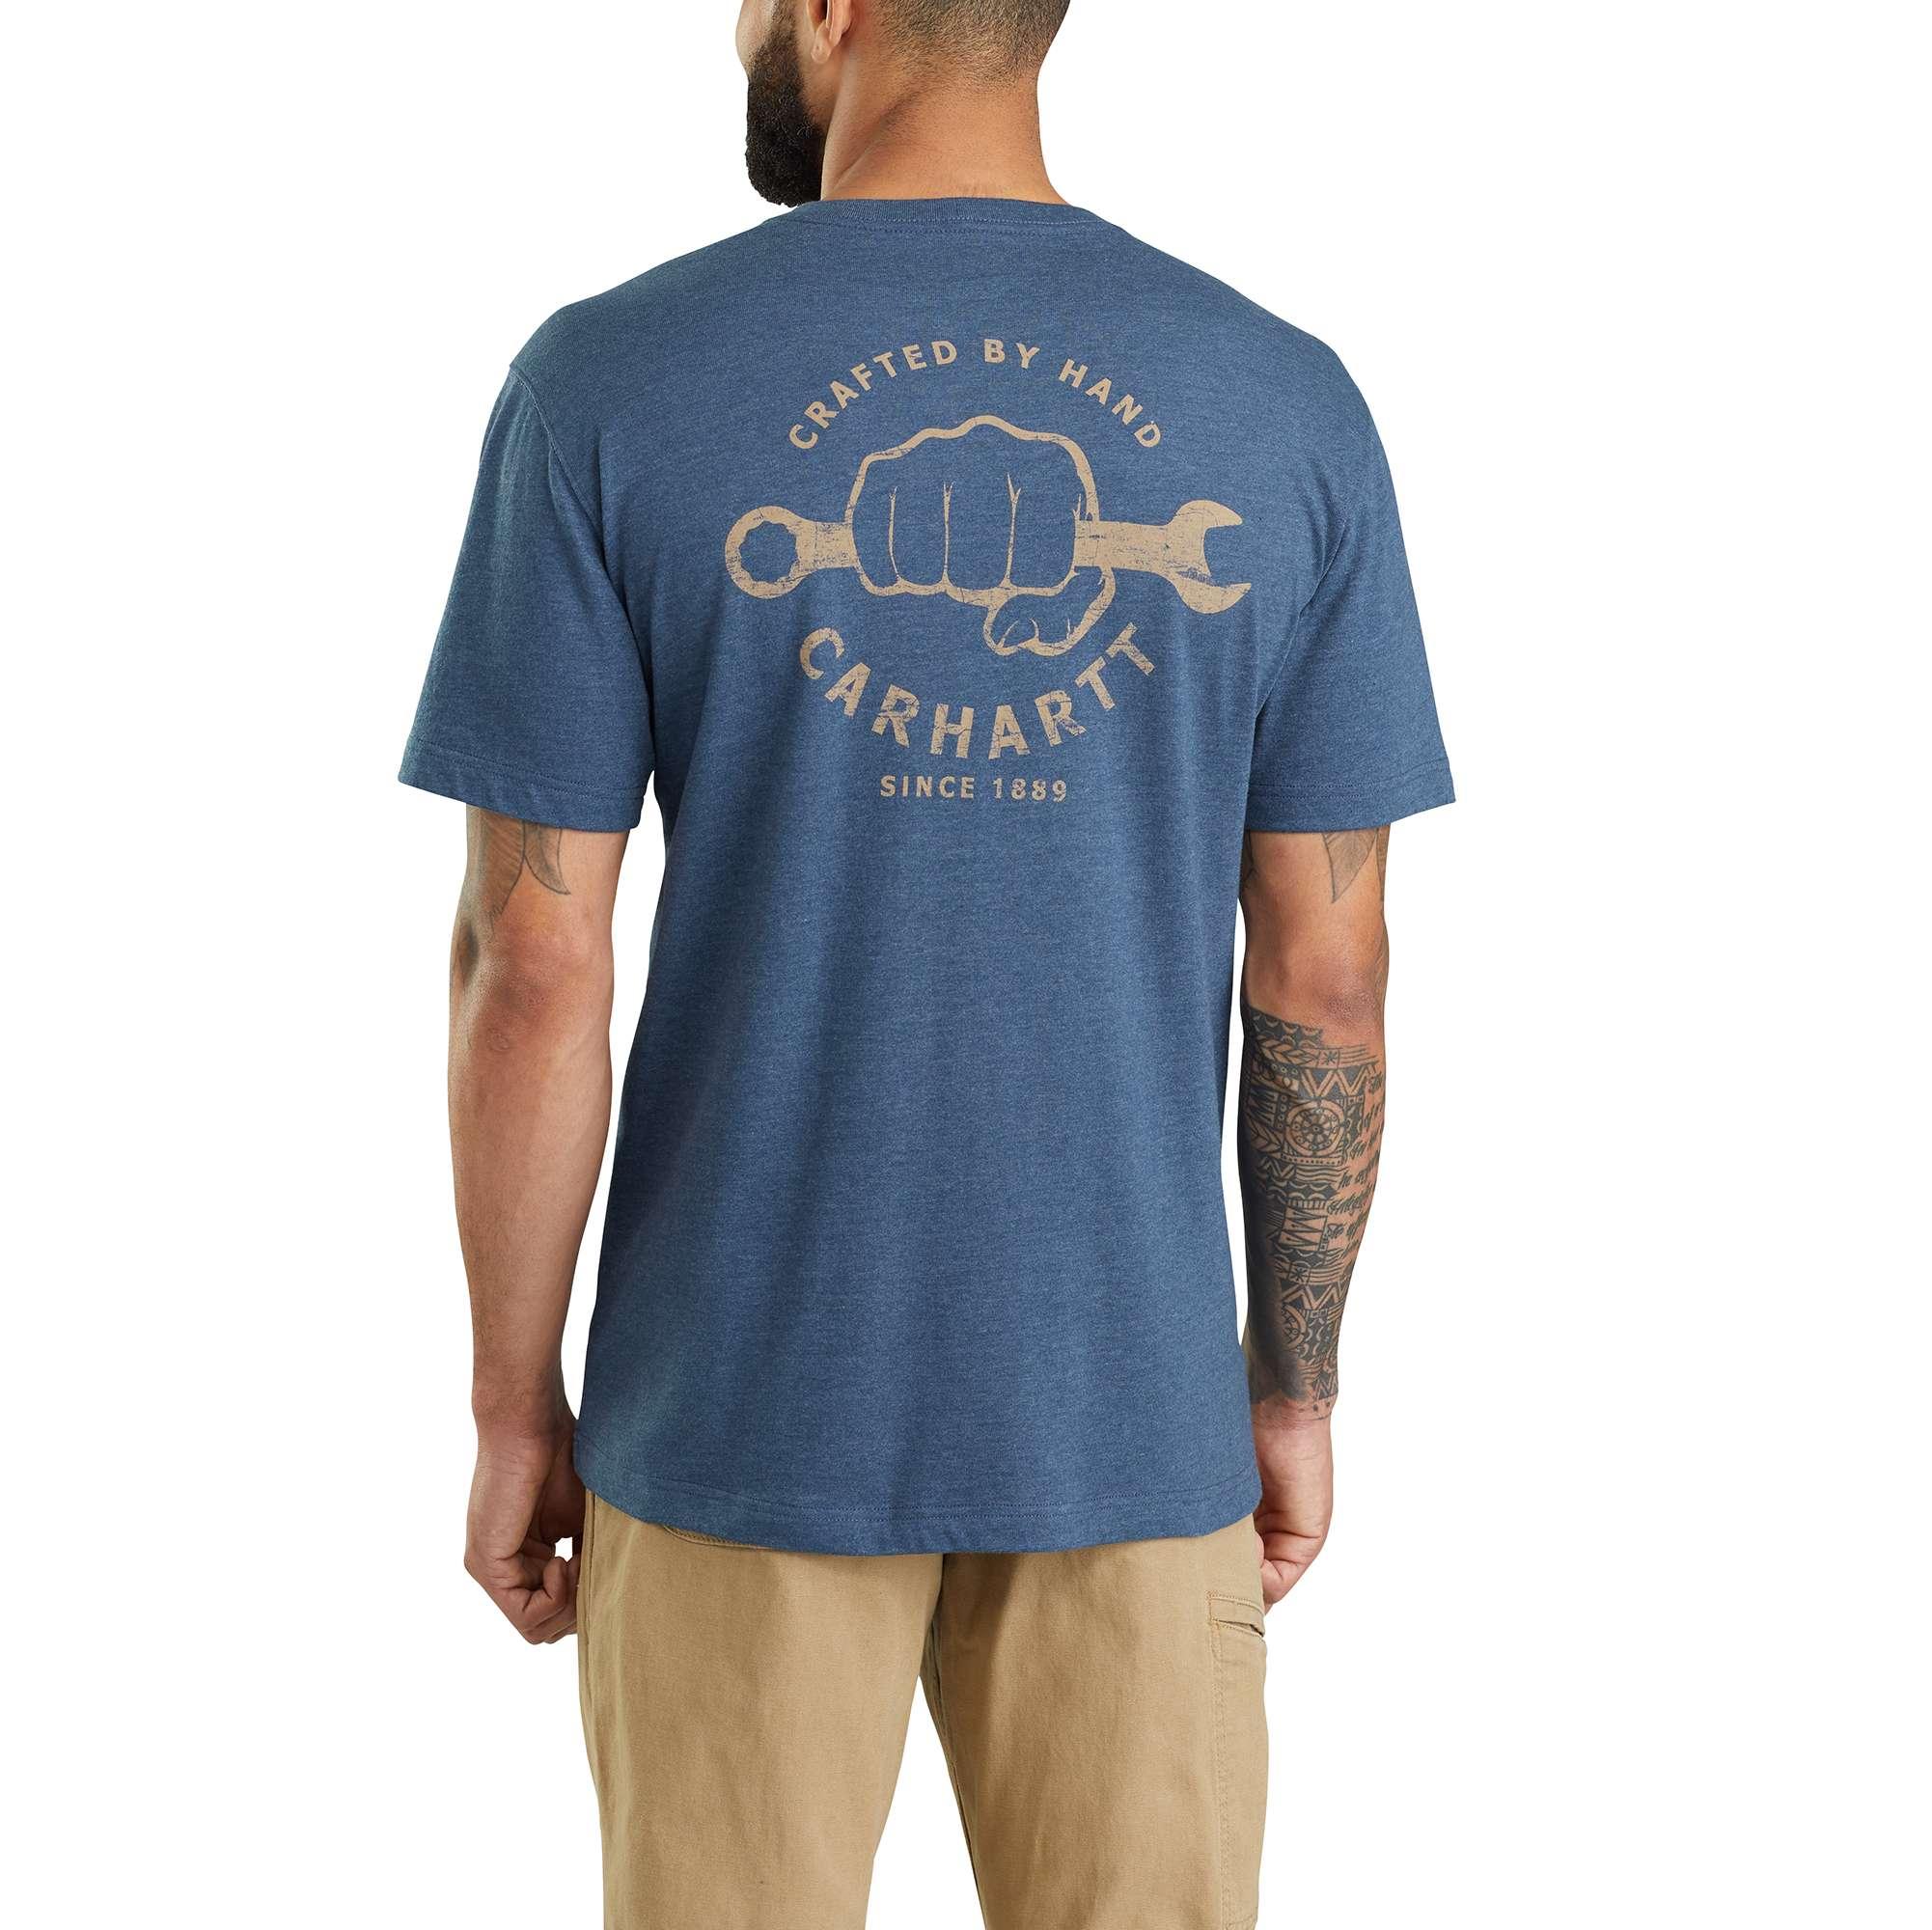 Carhartt Maddock Carhartt Strong Graphic Pocket Short-Sleeve T-Shirt